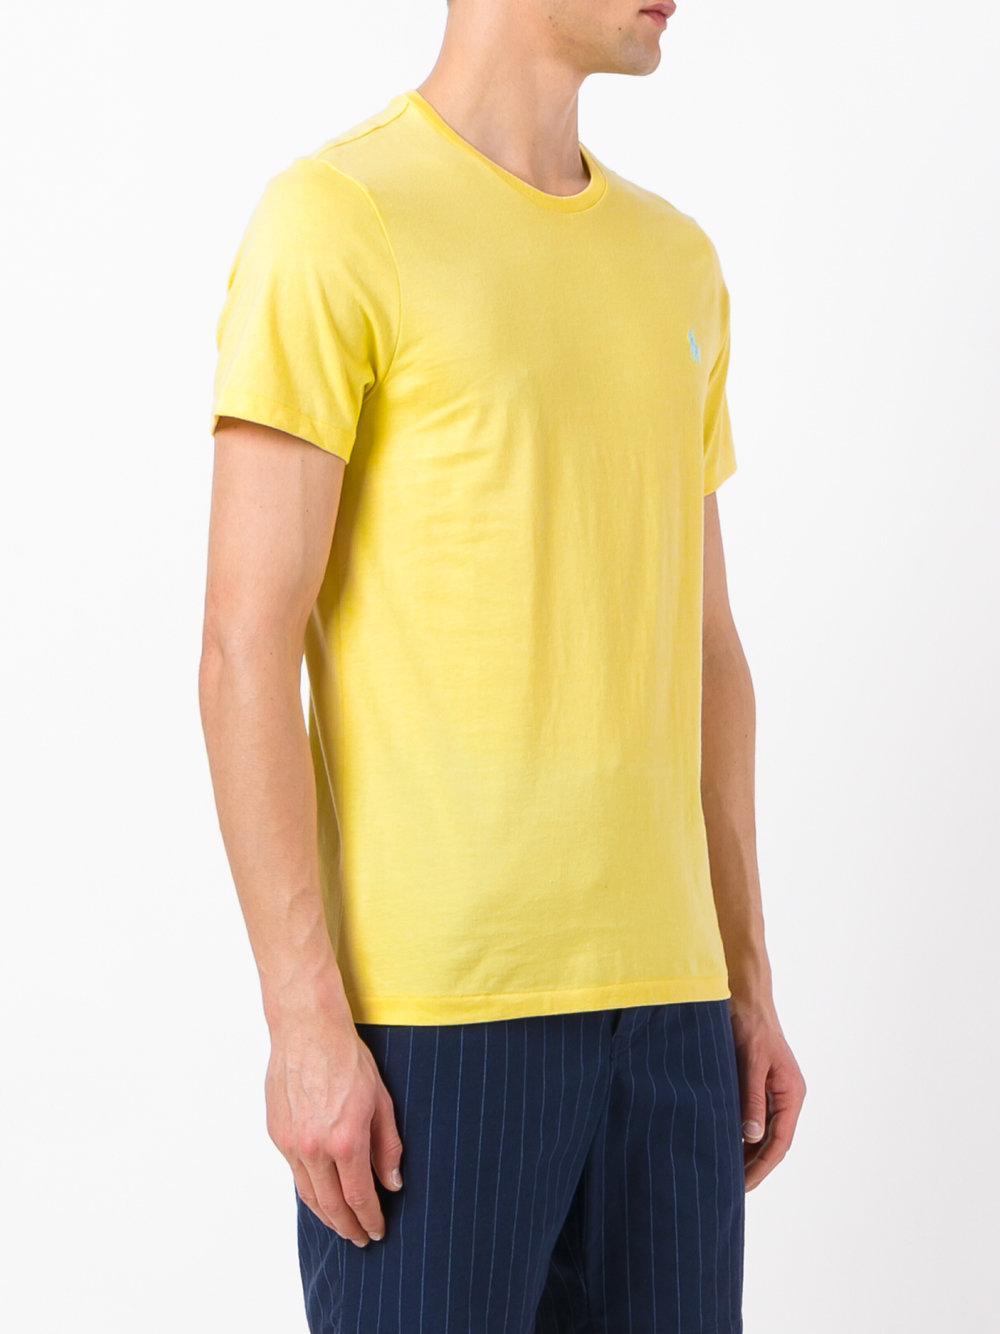 lyst polo ralph lauren short sleeve t shirt in yellow. Black Bedroom Furniture Sets. Home Design Ideas